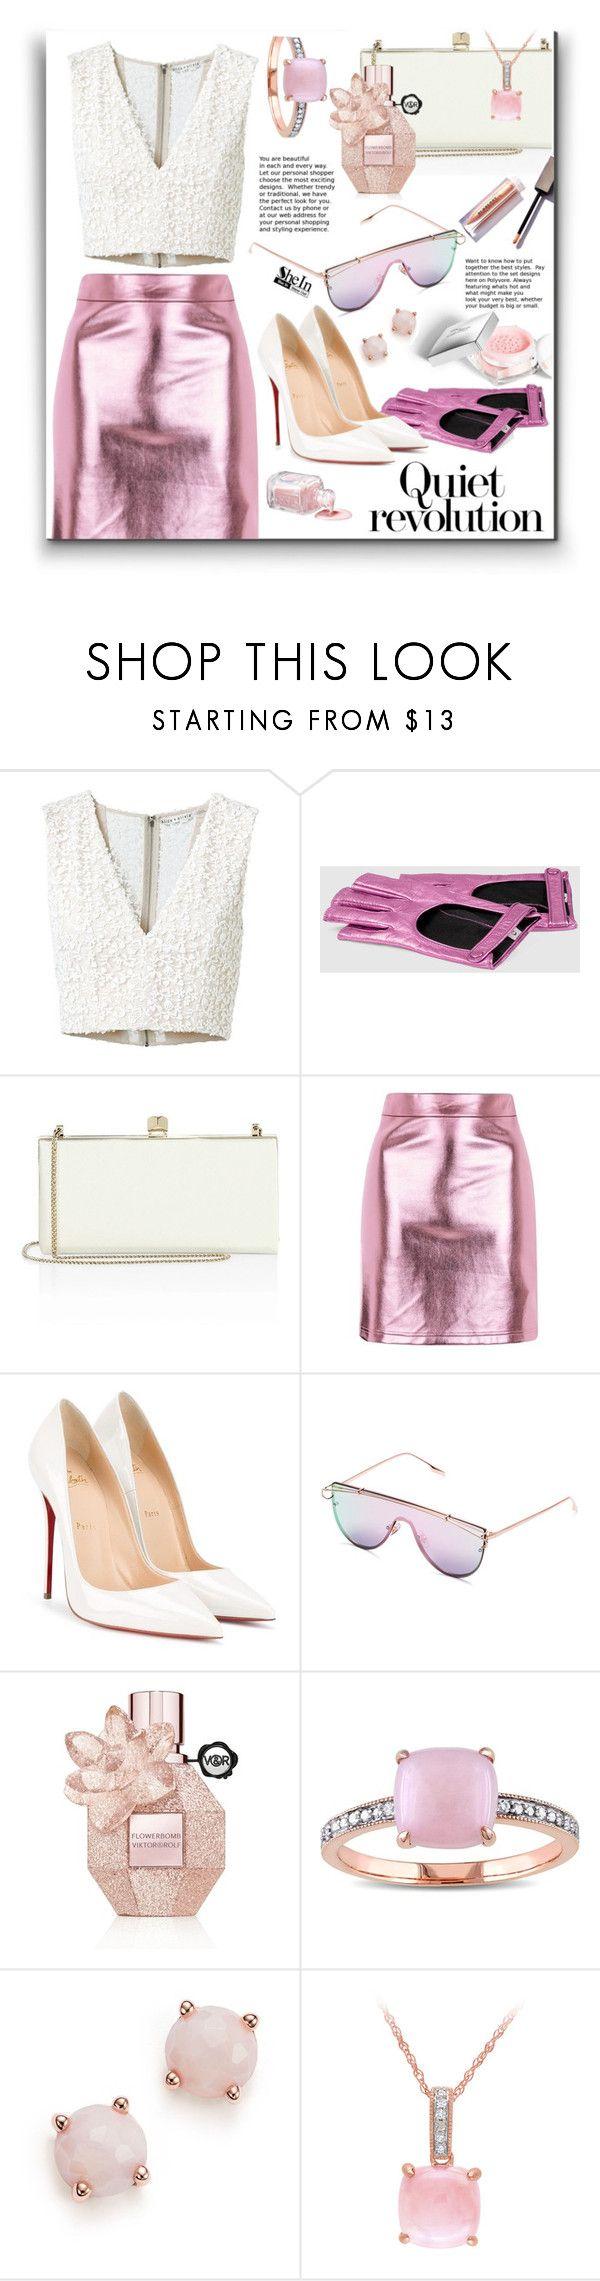 """Pink Sunglasses"" by ceci-alva ❤ liked on Polyvore featuring Alice + Olivia, Jimmy Choo, Topshop, Christian Louboutin, Christian Dior, Olsen, Viktor & Rolf, Miadora and Ippolita"